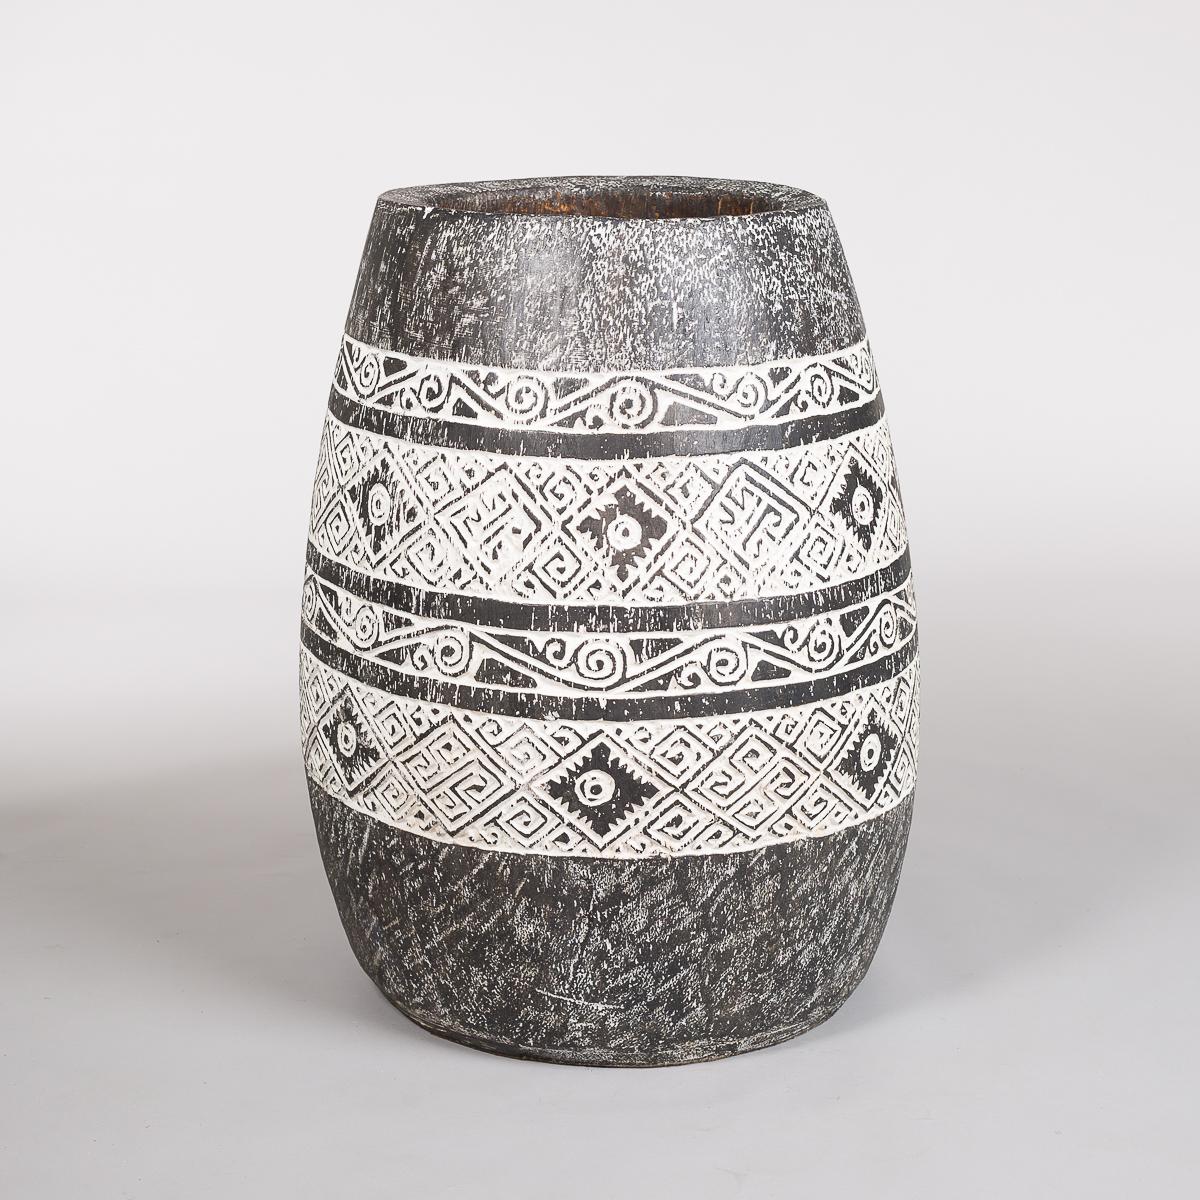 Palme potte, høyde 75 cm-0